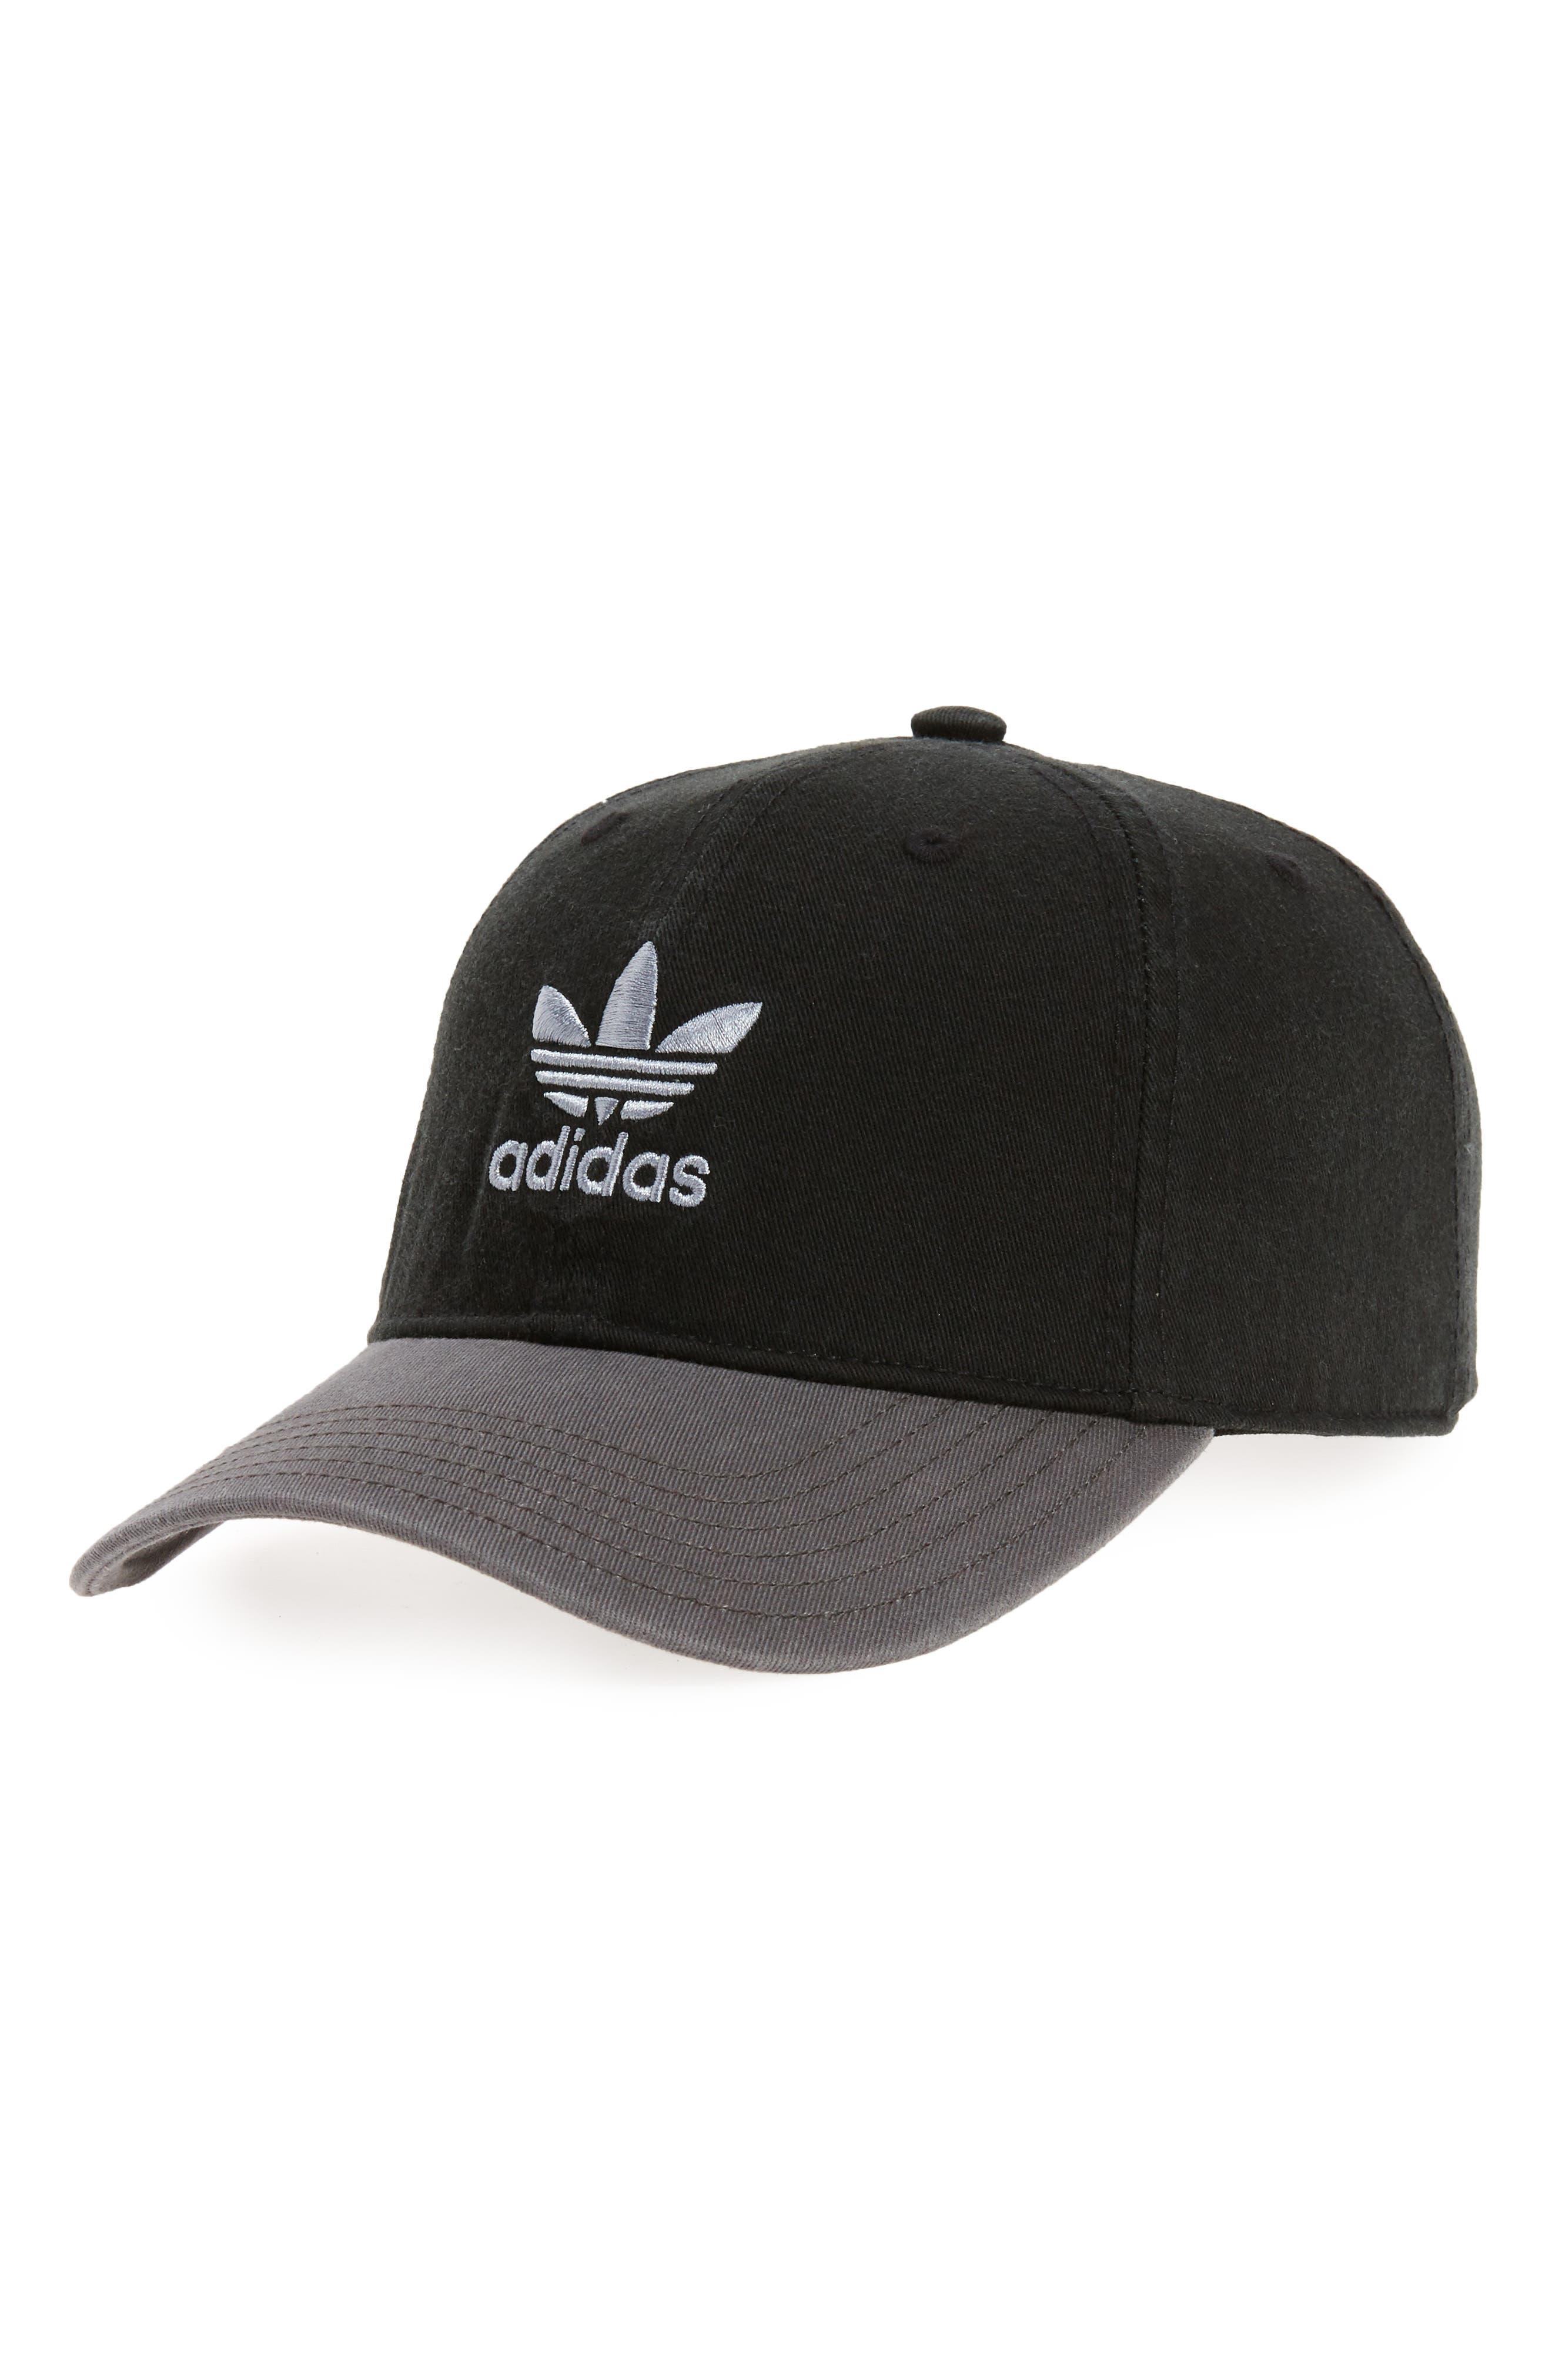 adidas Originals Relaxed Snapback Baseball Cap